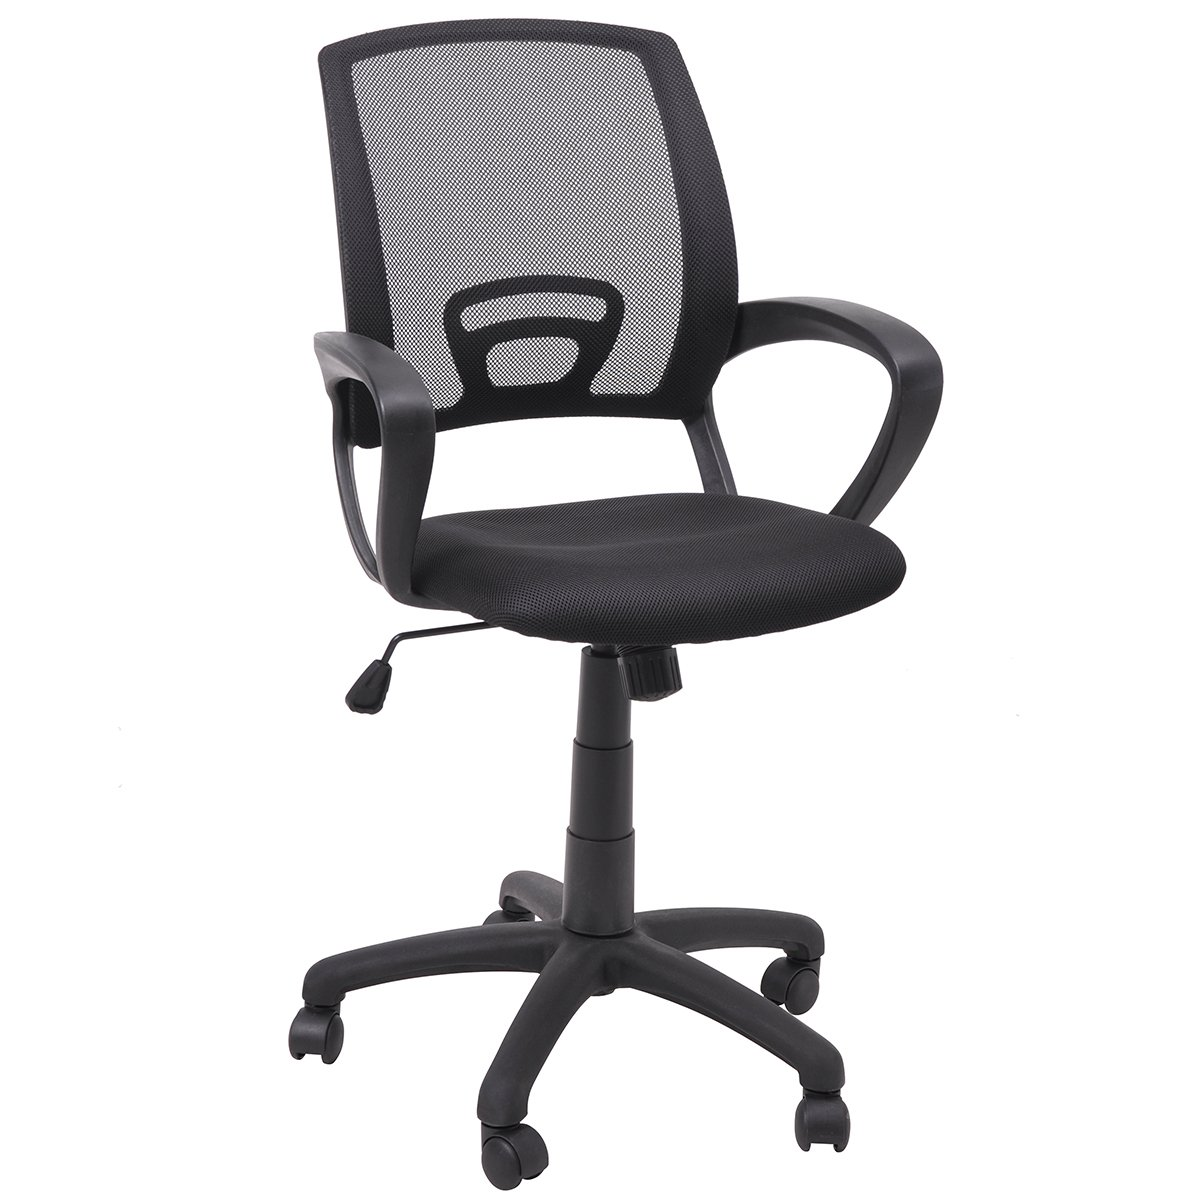 FurnitureR Office Chair, Ergonomic, Executive Computer Desk, Mid Back Mesh Swivel, Black